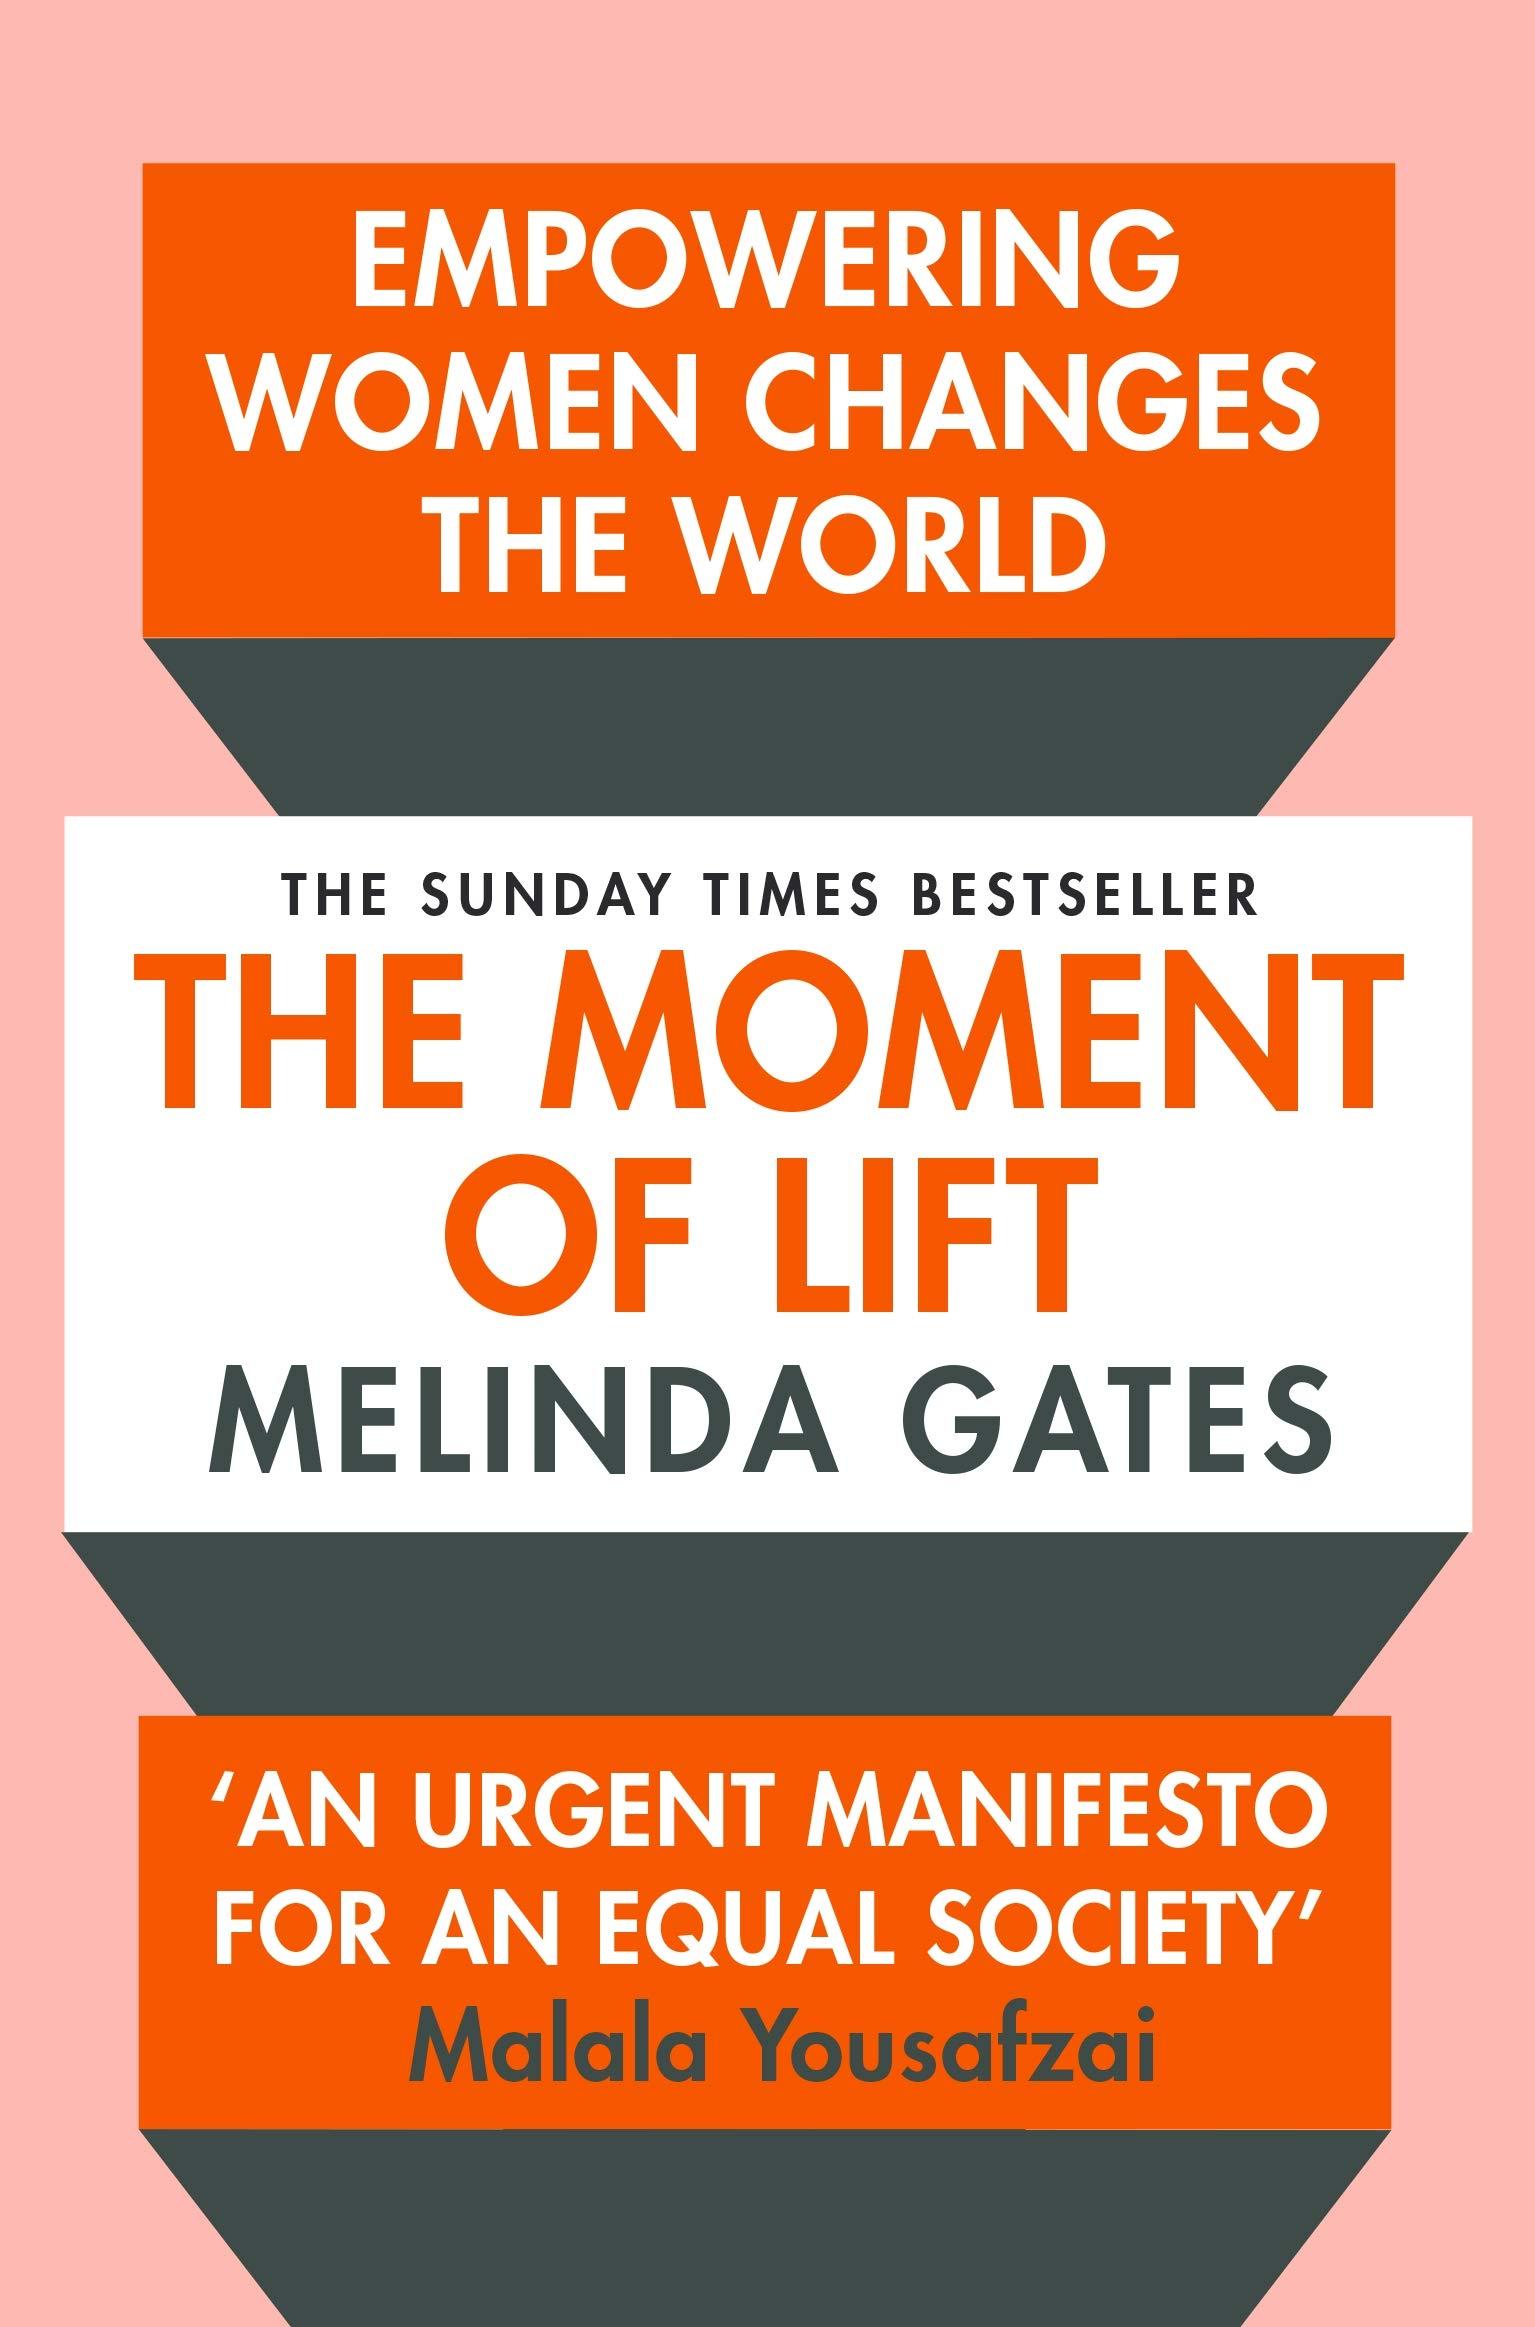 The Moment of Lift: How Empowering Women Changes the World: Amazon.de: Gates,  Melinda: Fremdsprachige Bücher